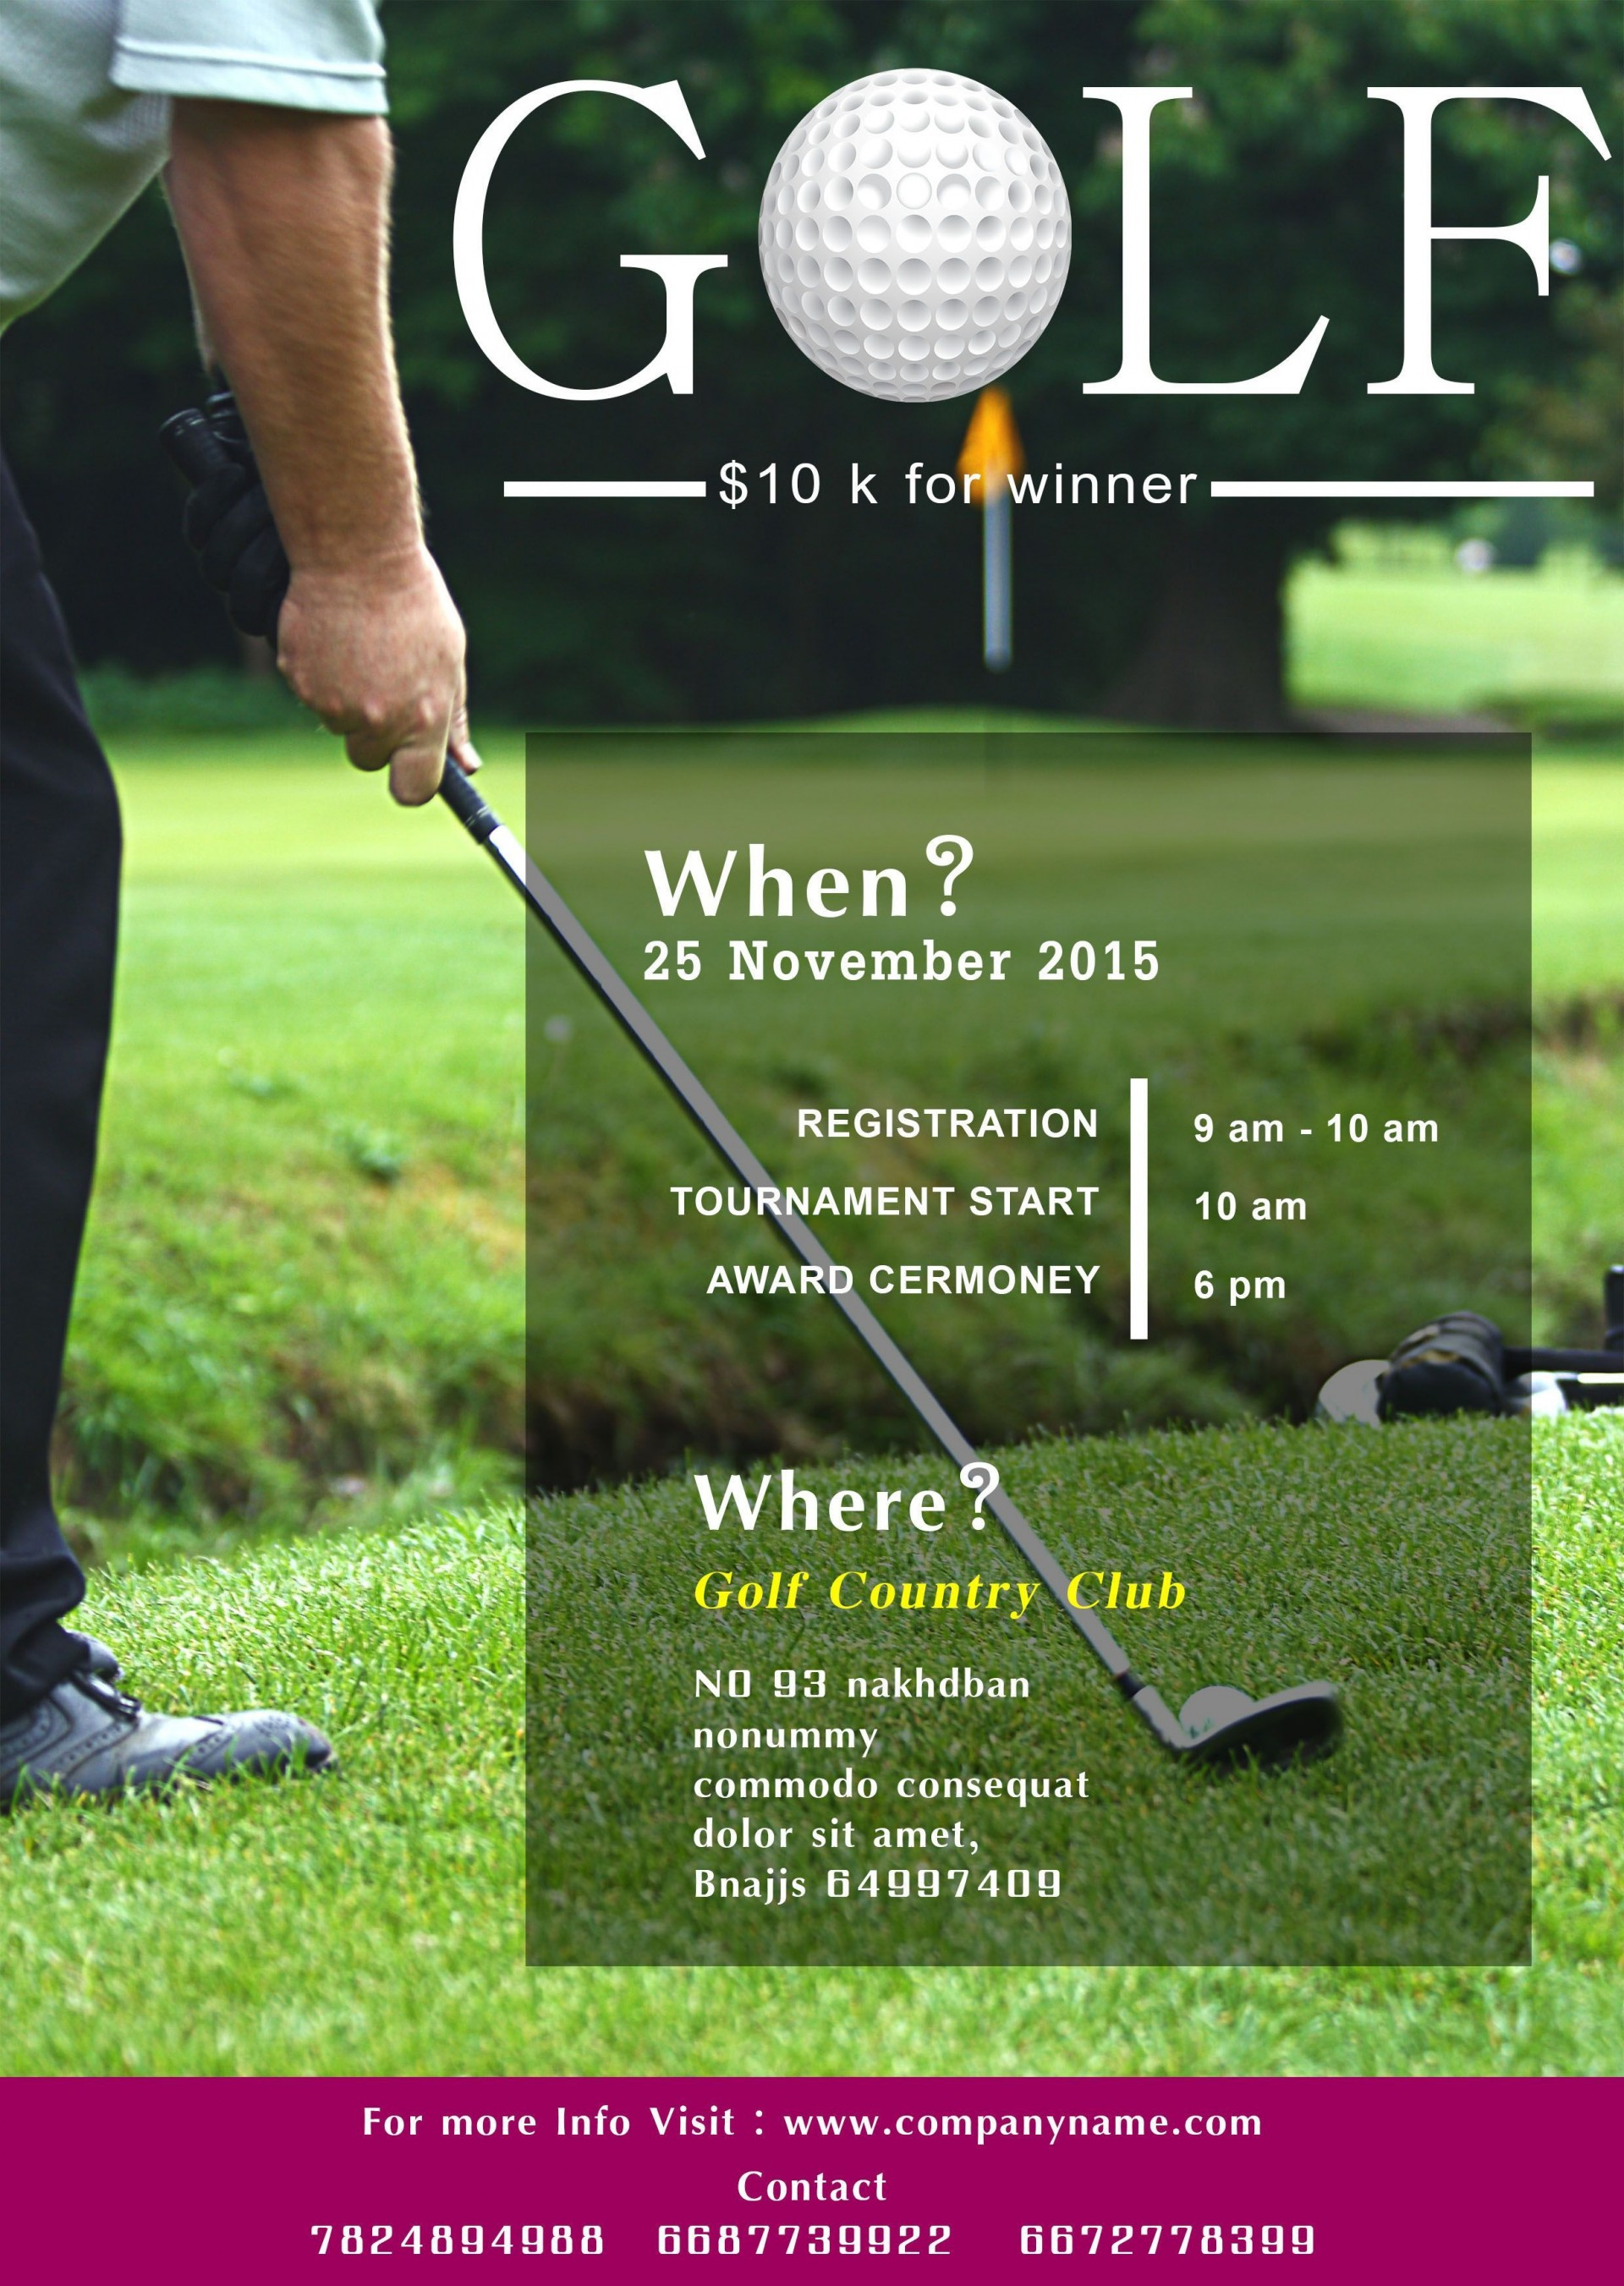 006 Stirring Golf Tournament Flyer Template Photo  Word Free Pdf1920